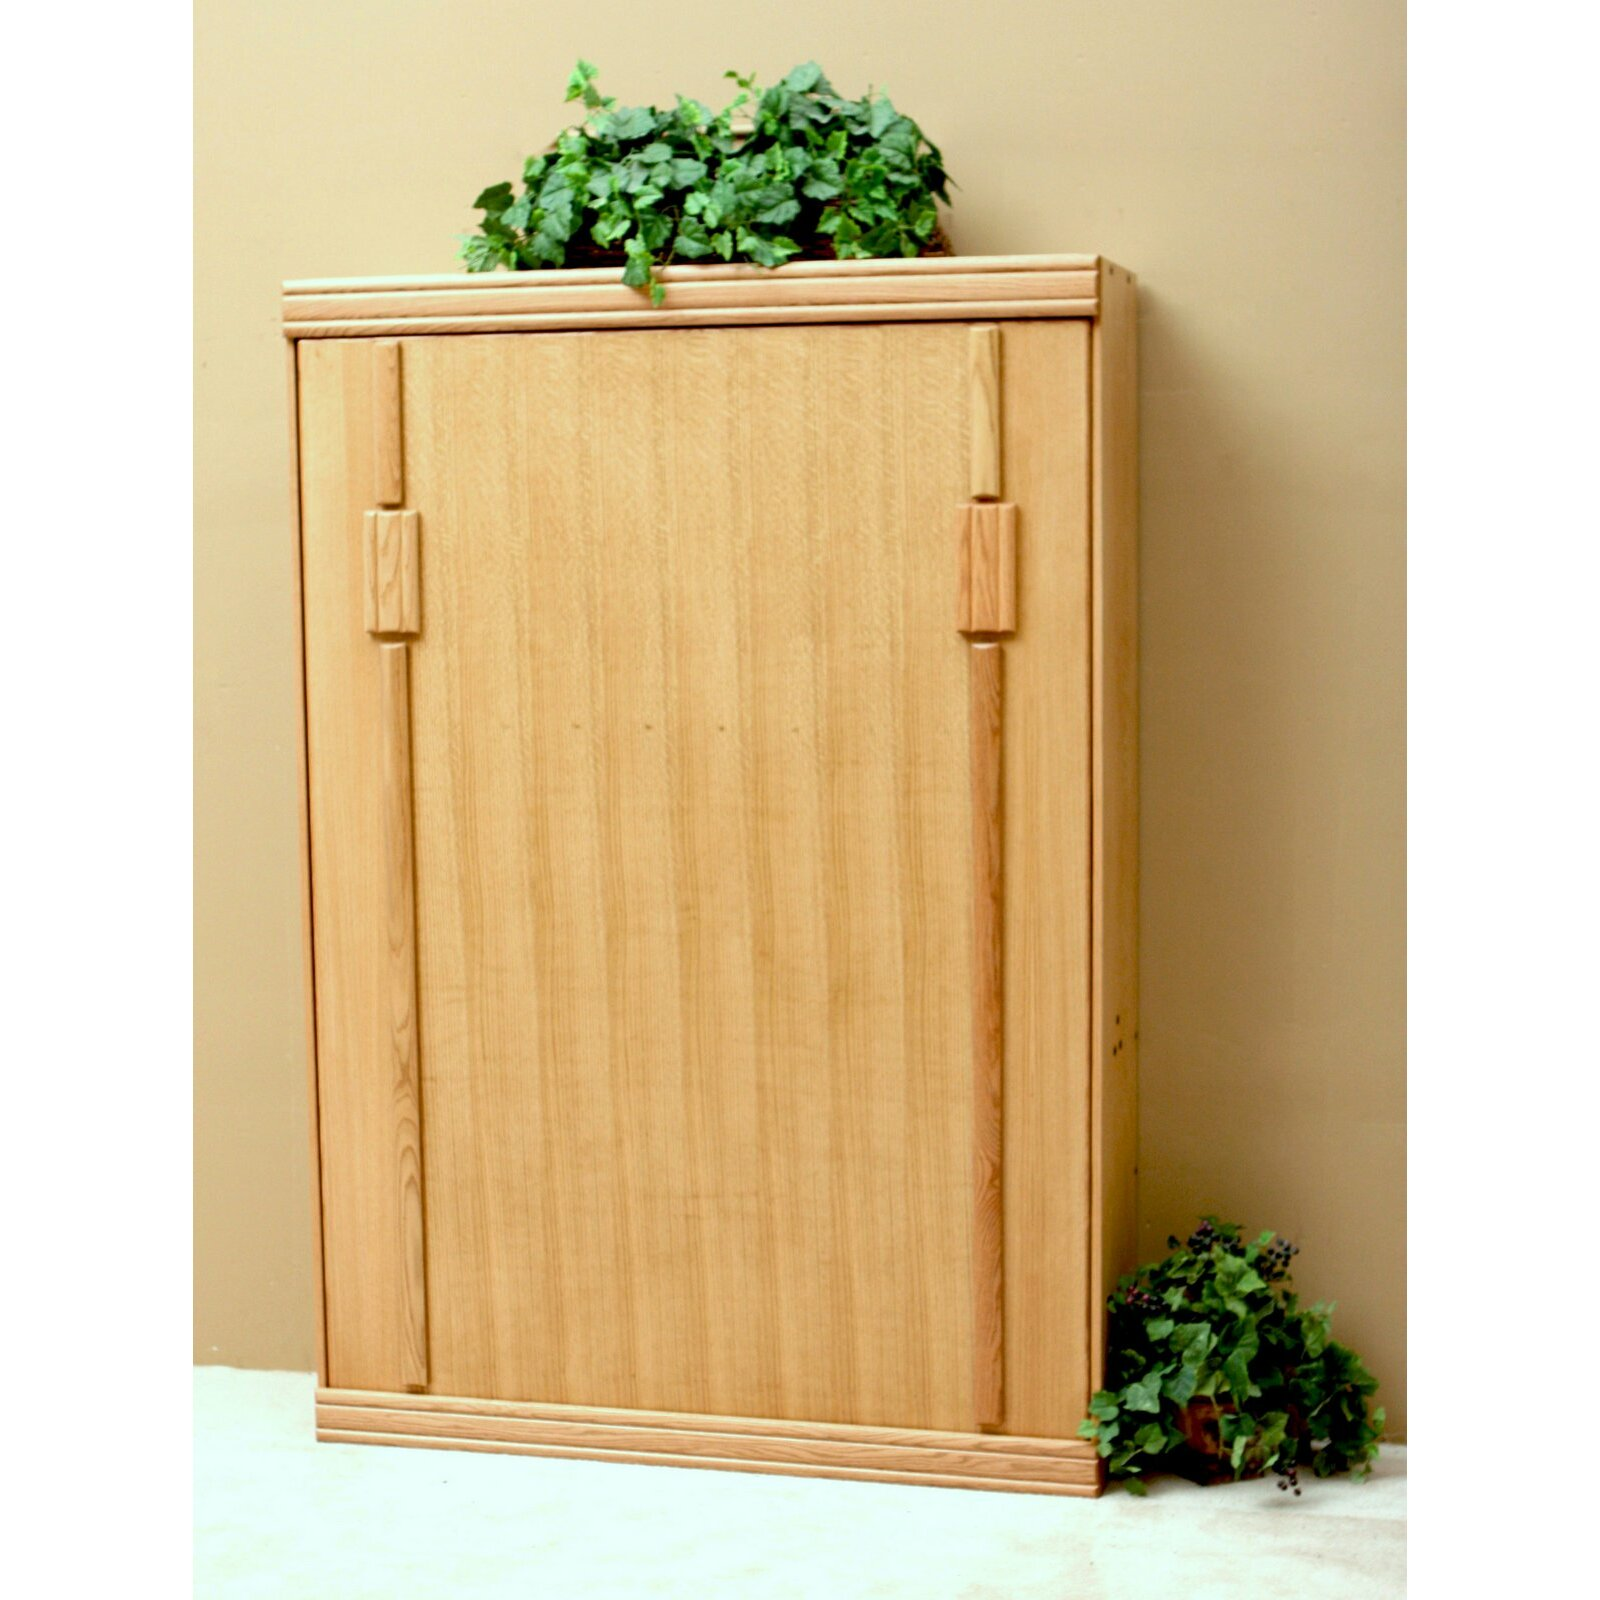 Wallbeds Contemporary Oak Storage Murphy Bed & Reviews | Wayfair